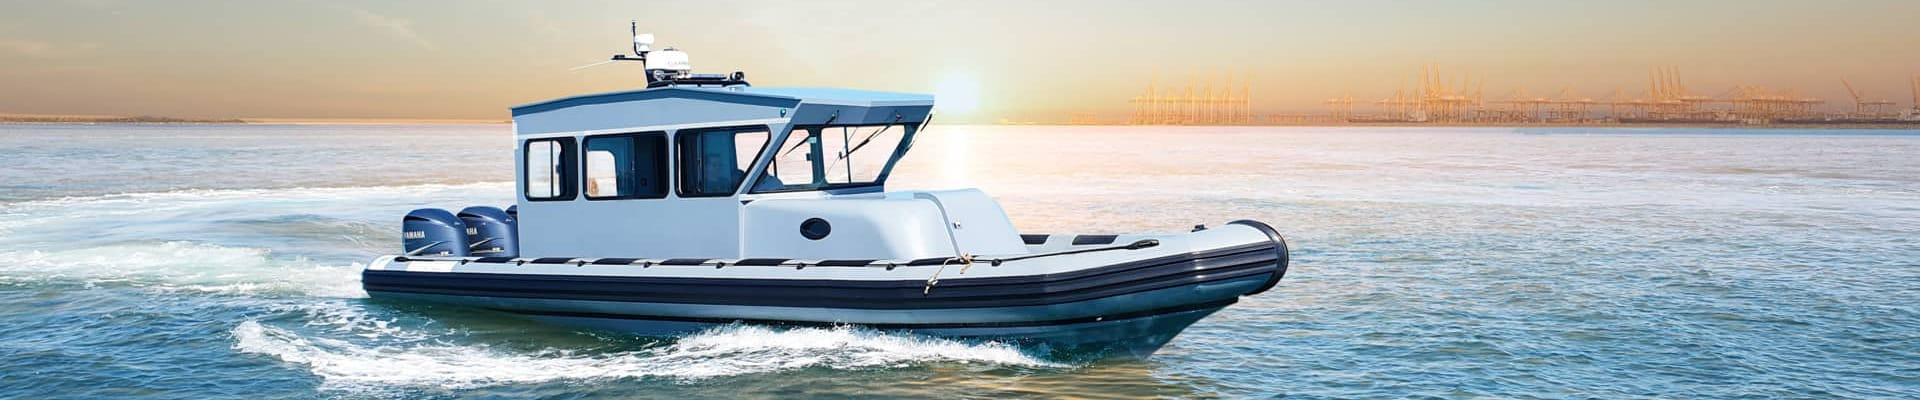 military-cabin-rib-boat